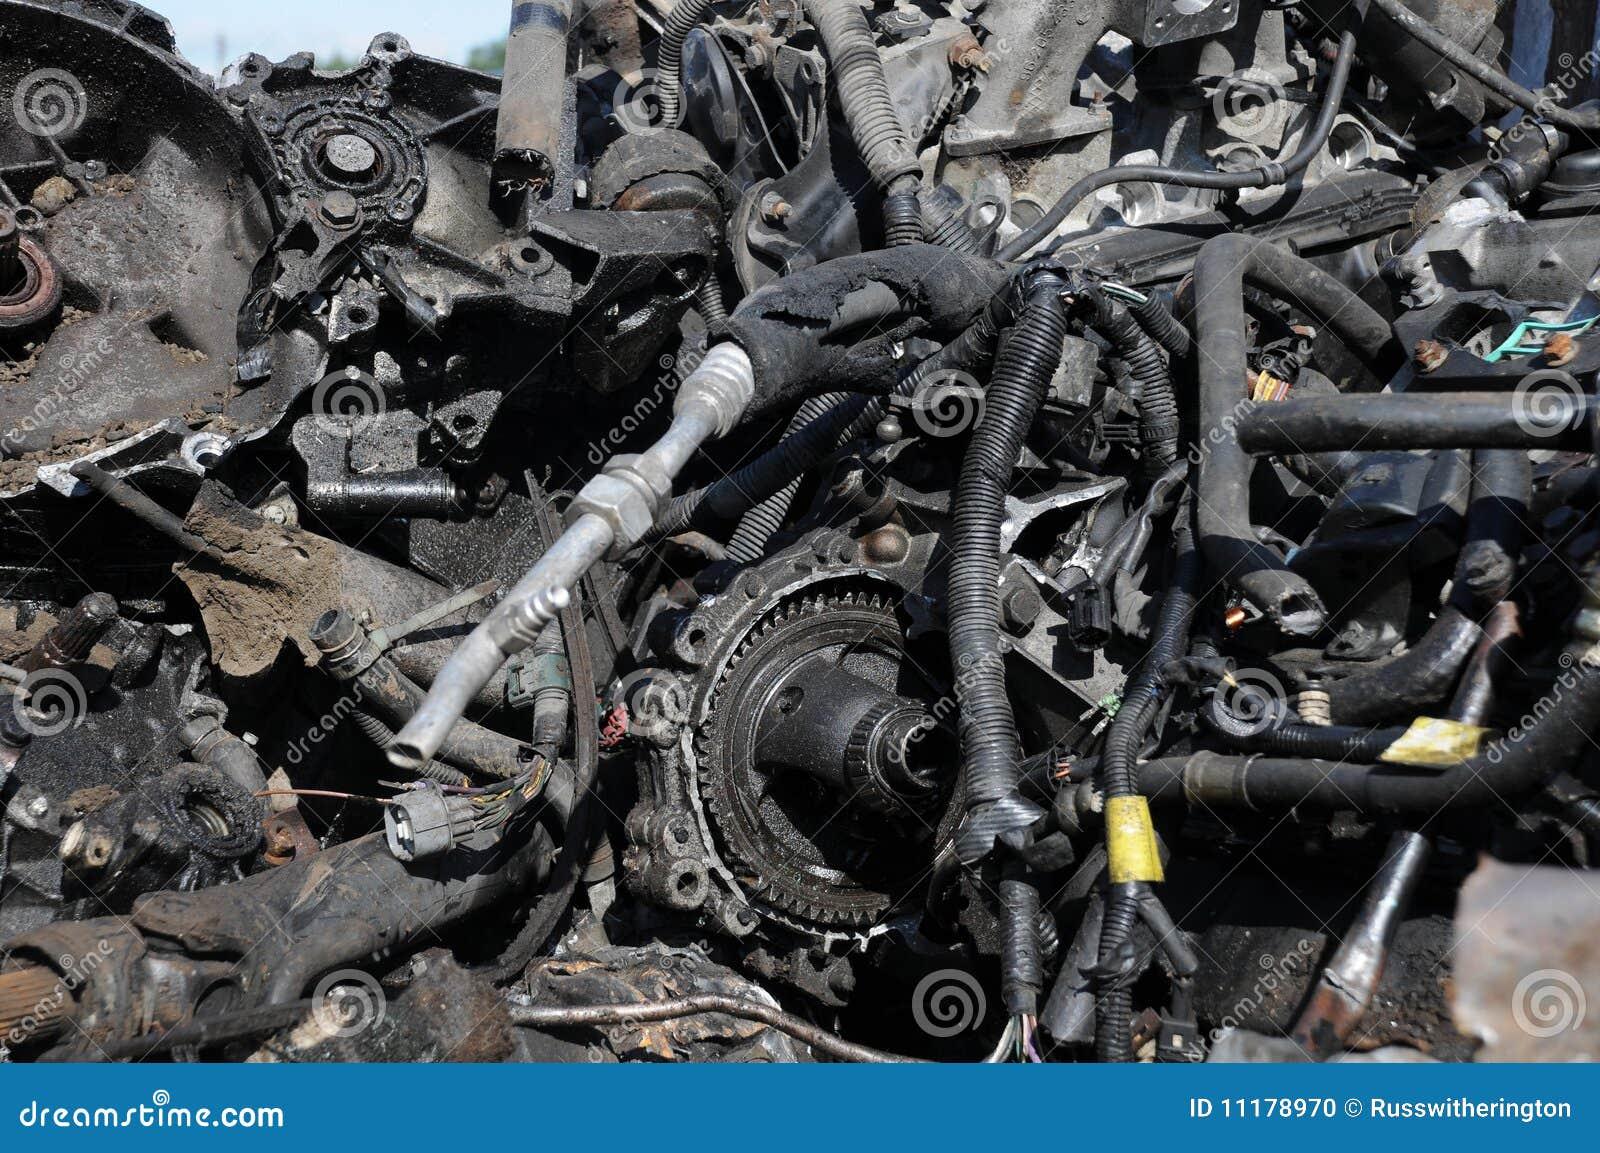 Car Scrap Parts Singapore